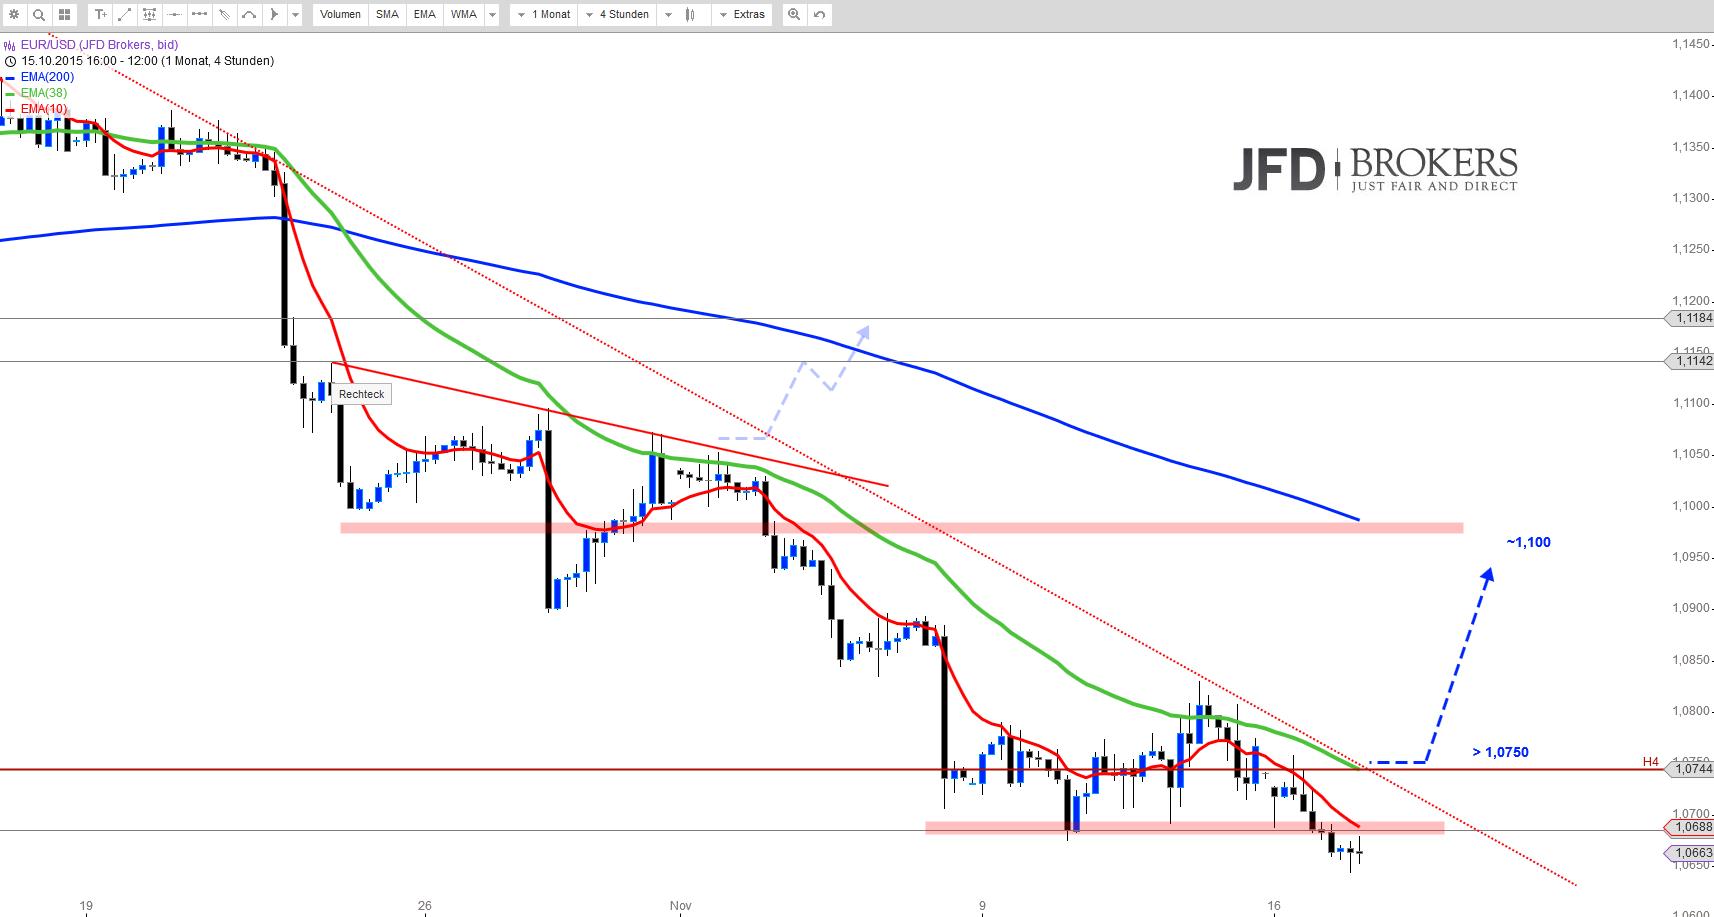 EUR-USD-H4-Im-Zweifel-Short-oder-etwa-doch-nicht-Kommentar-JFD-Brokers-GodmodeTrader.de-1